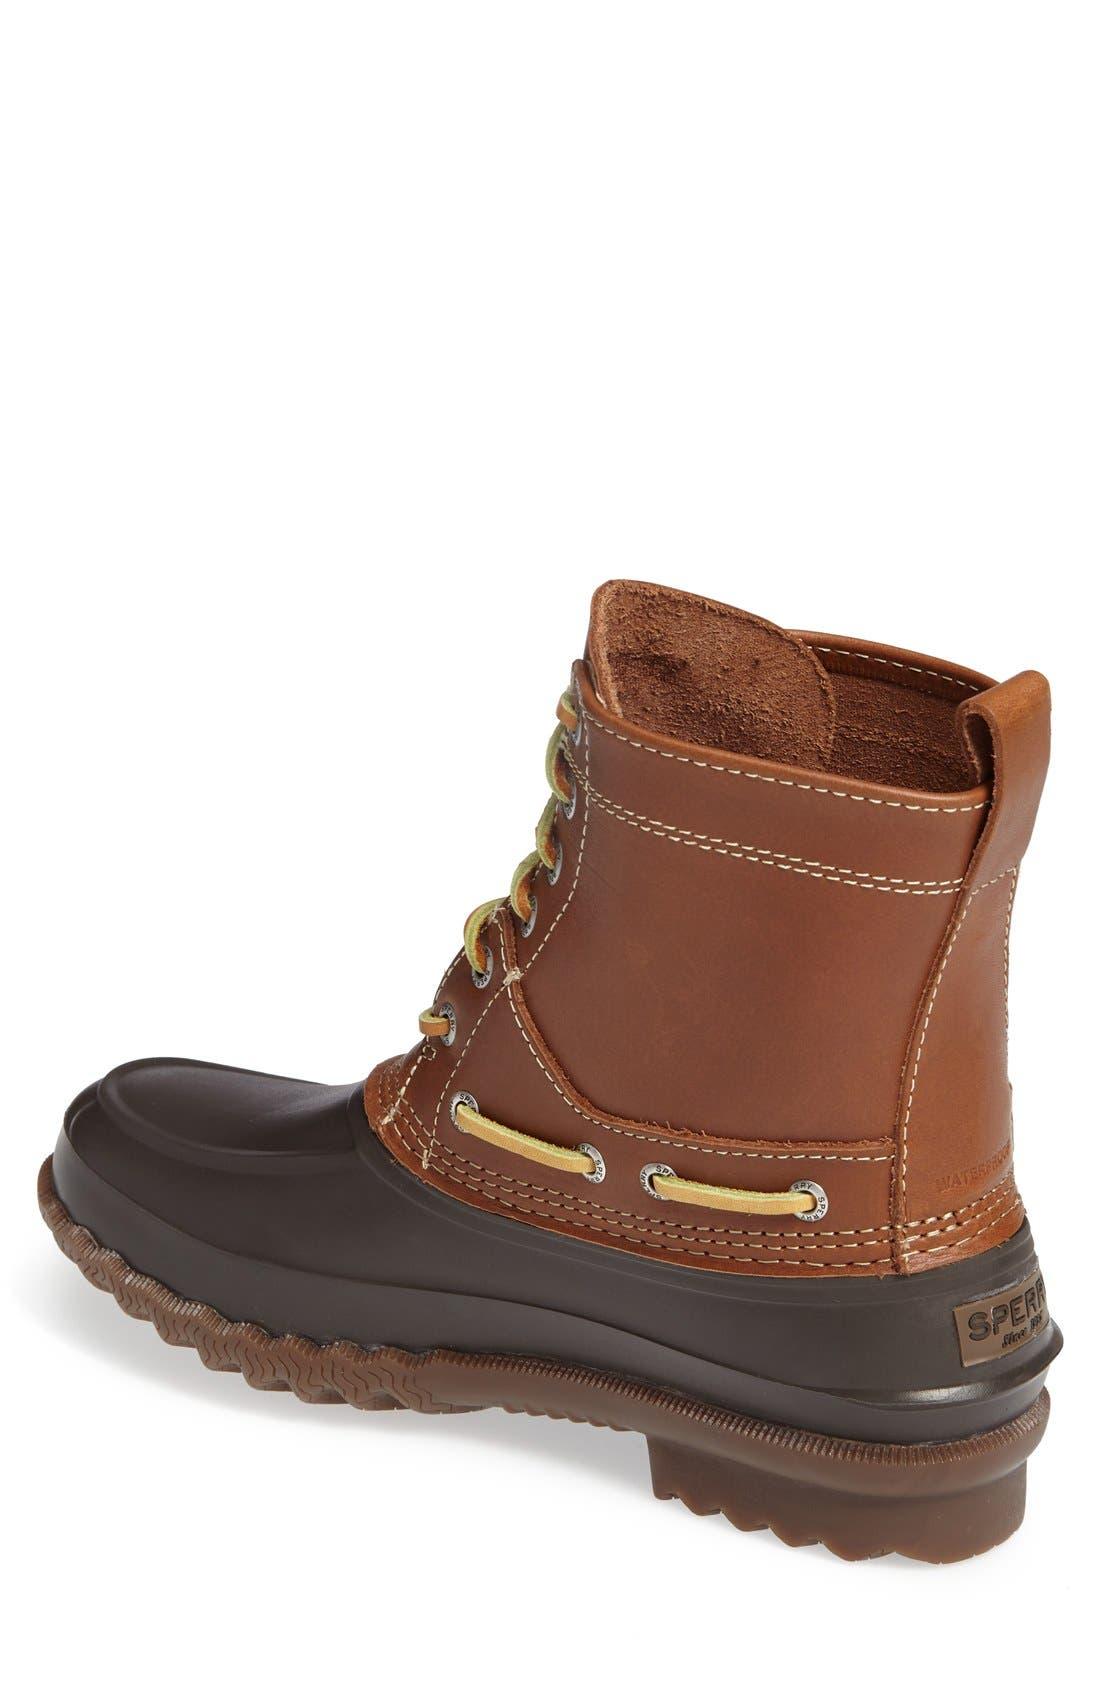 Alternate Image 2  - Sperry 'Decoy' Waterproof Boot (Men)